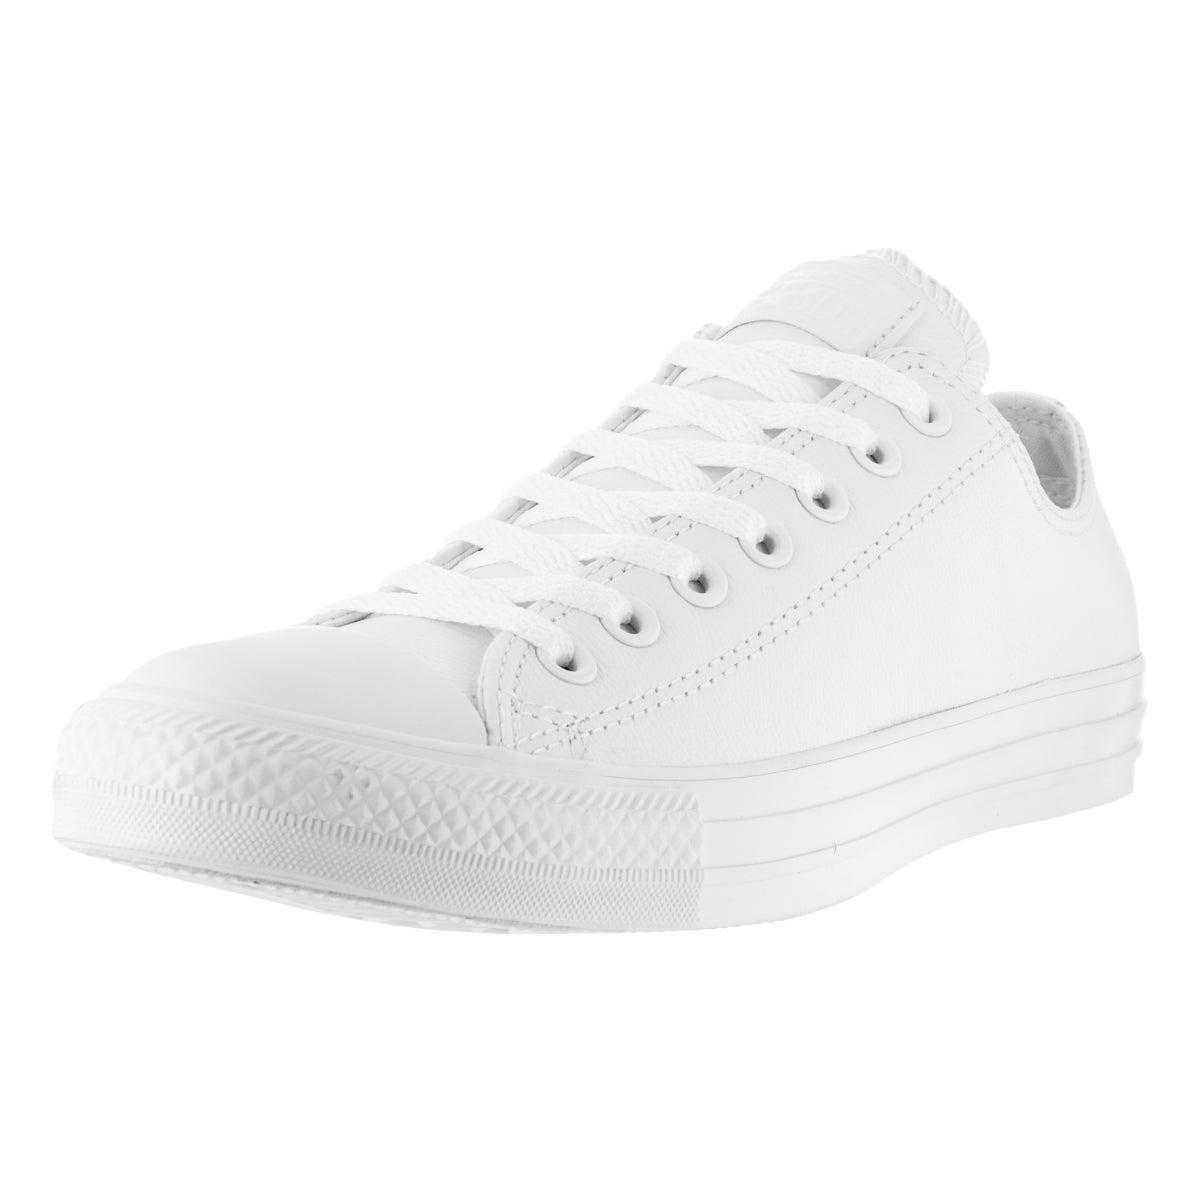 Converse Unisex Chuck Taylor All Star Ox Basketball Shoe ...